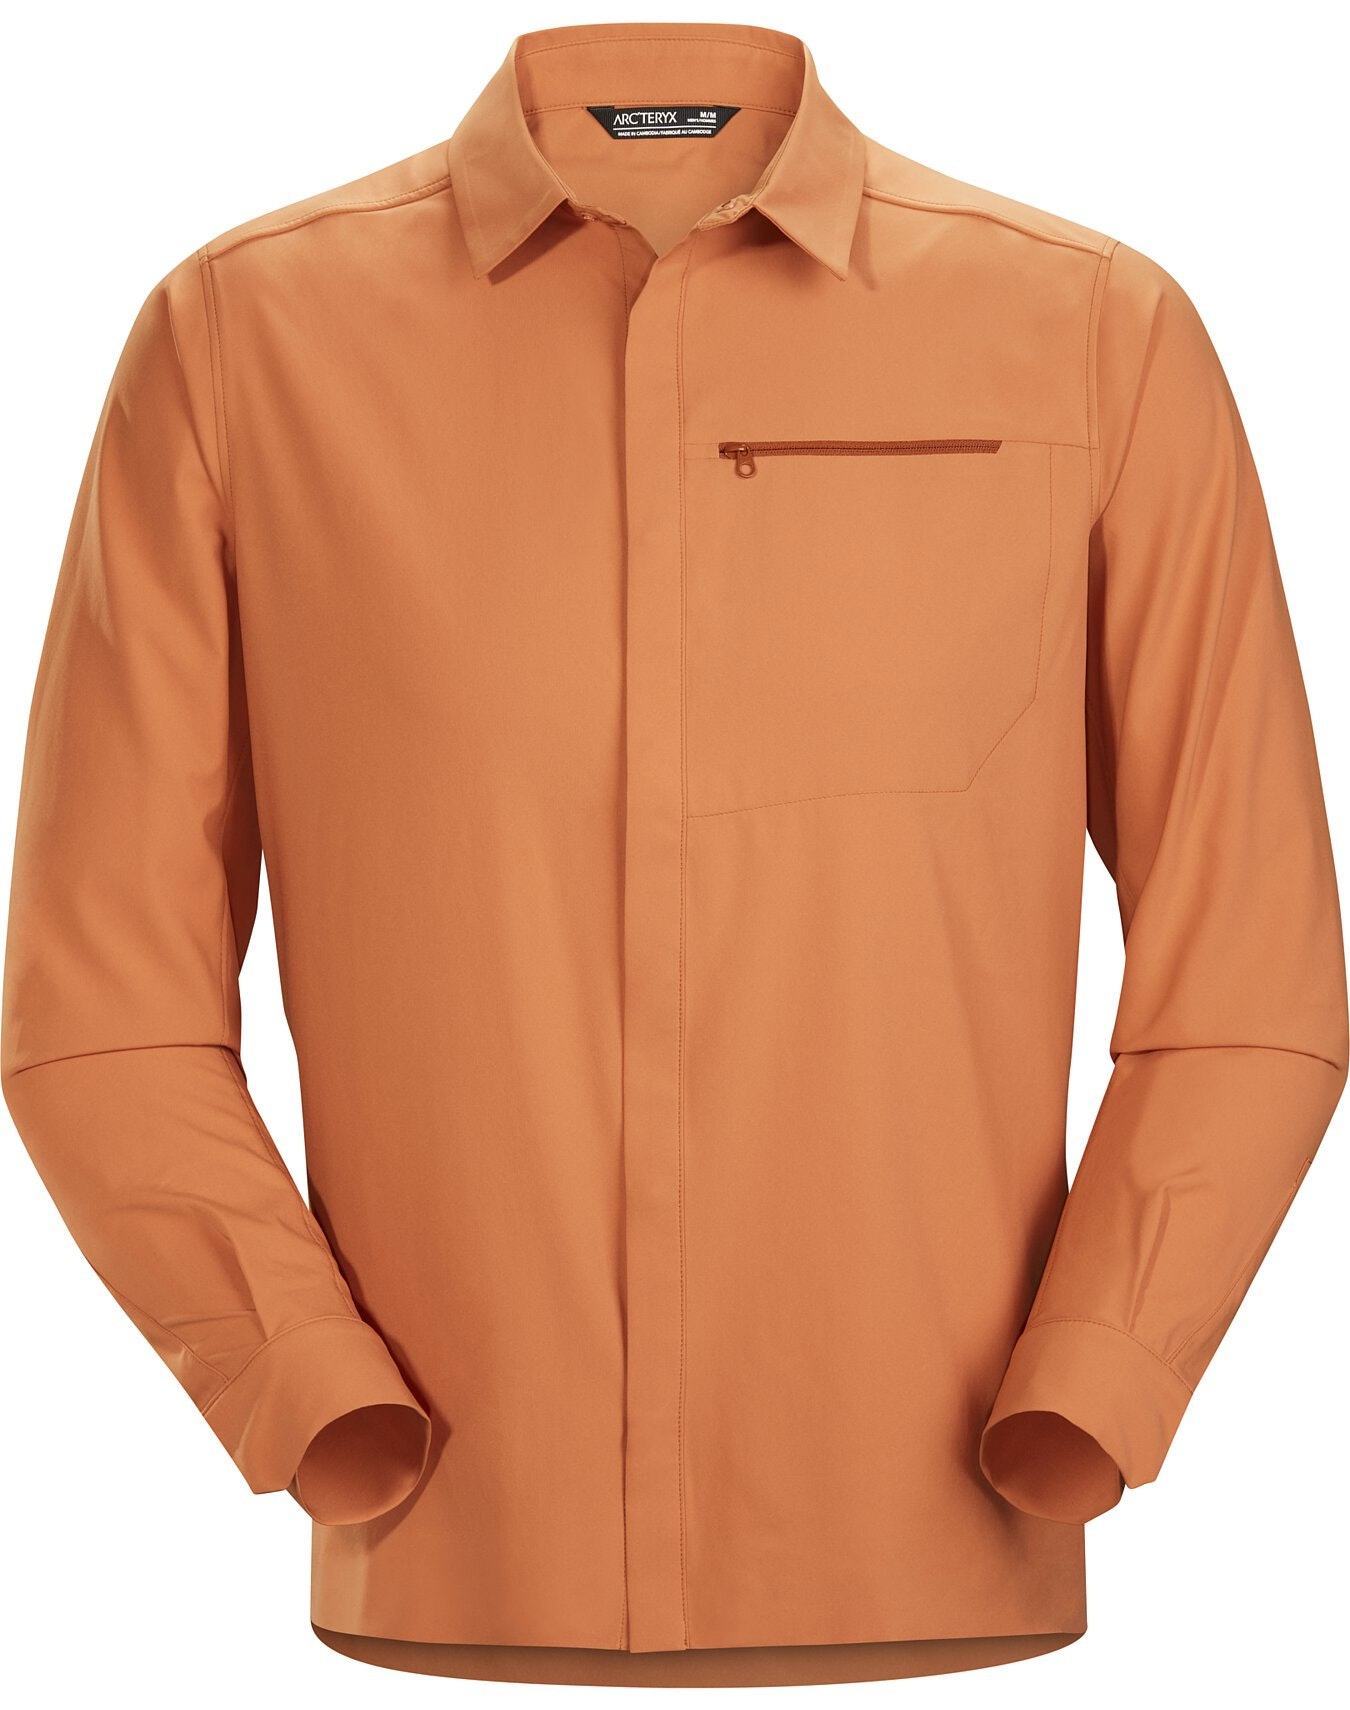 Skyline Shirt LS Terracopper